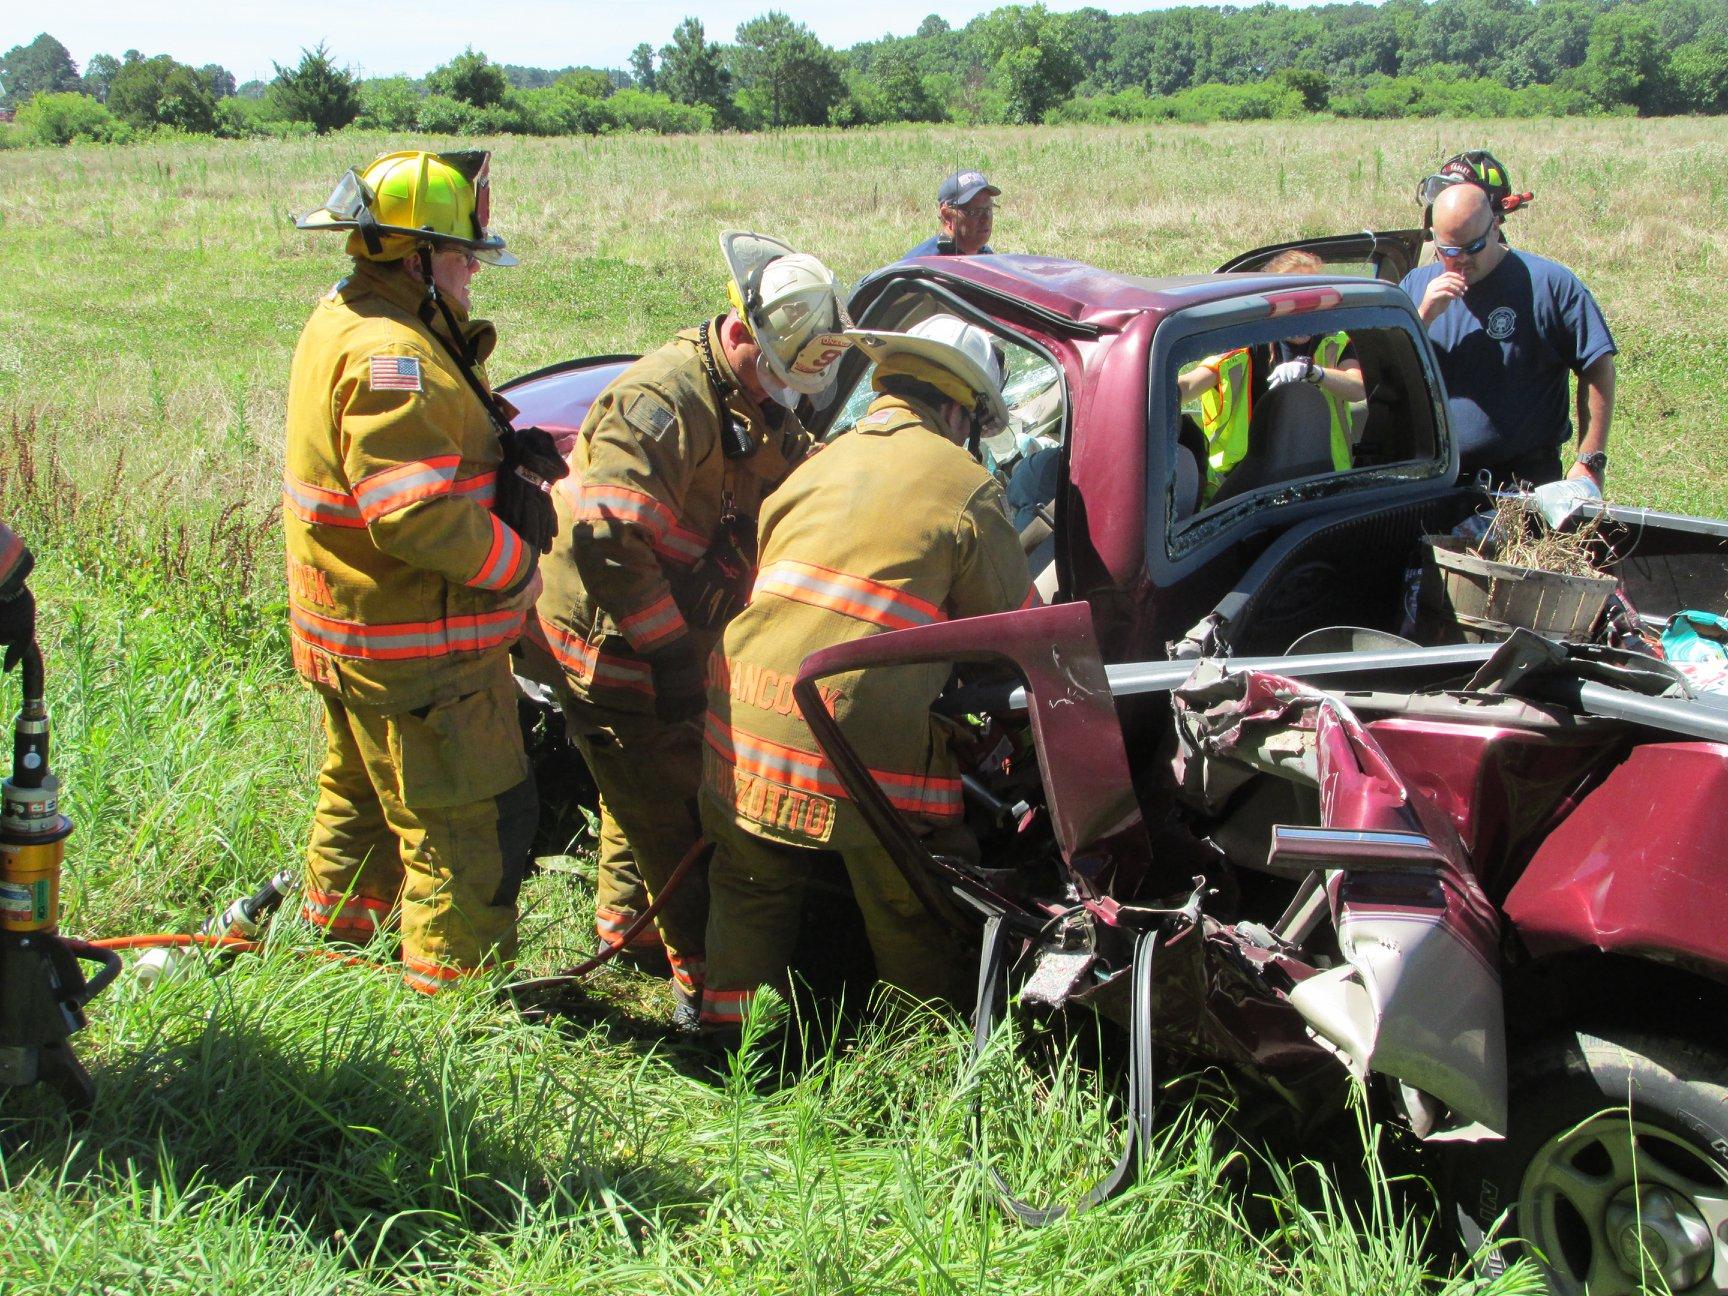 Onancock Fire Dept Crash Pic (17)_1531247210342.jpg.jpg